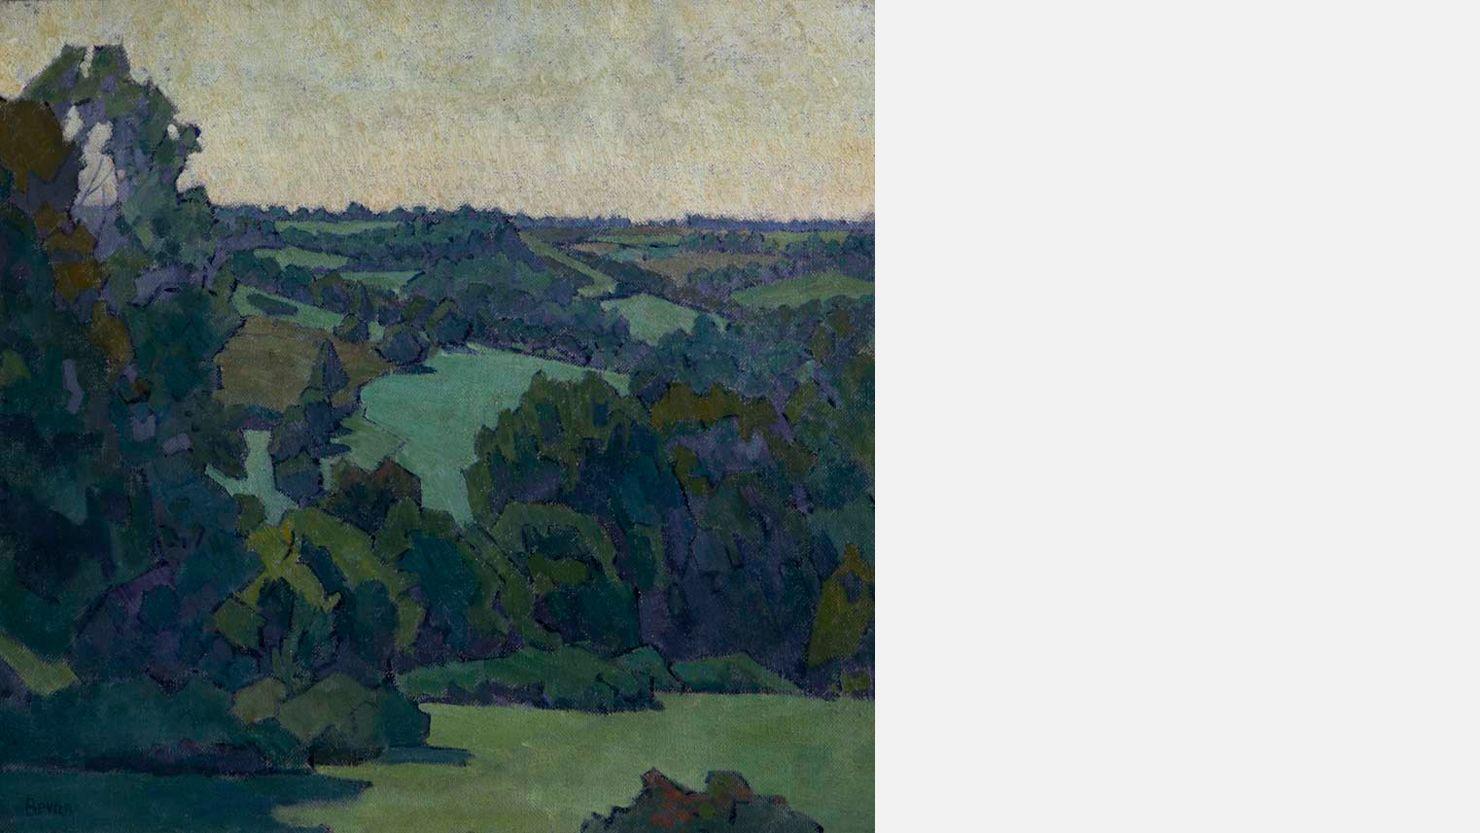 Green Devon, 1919 by Robert Pohill Bevan